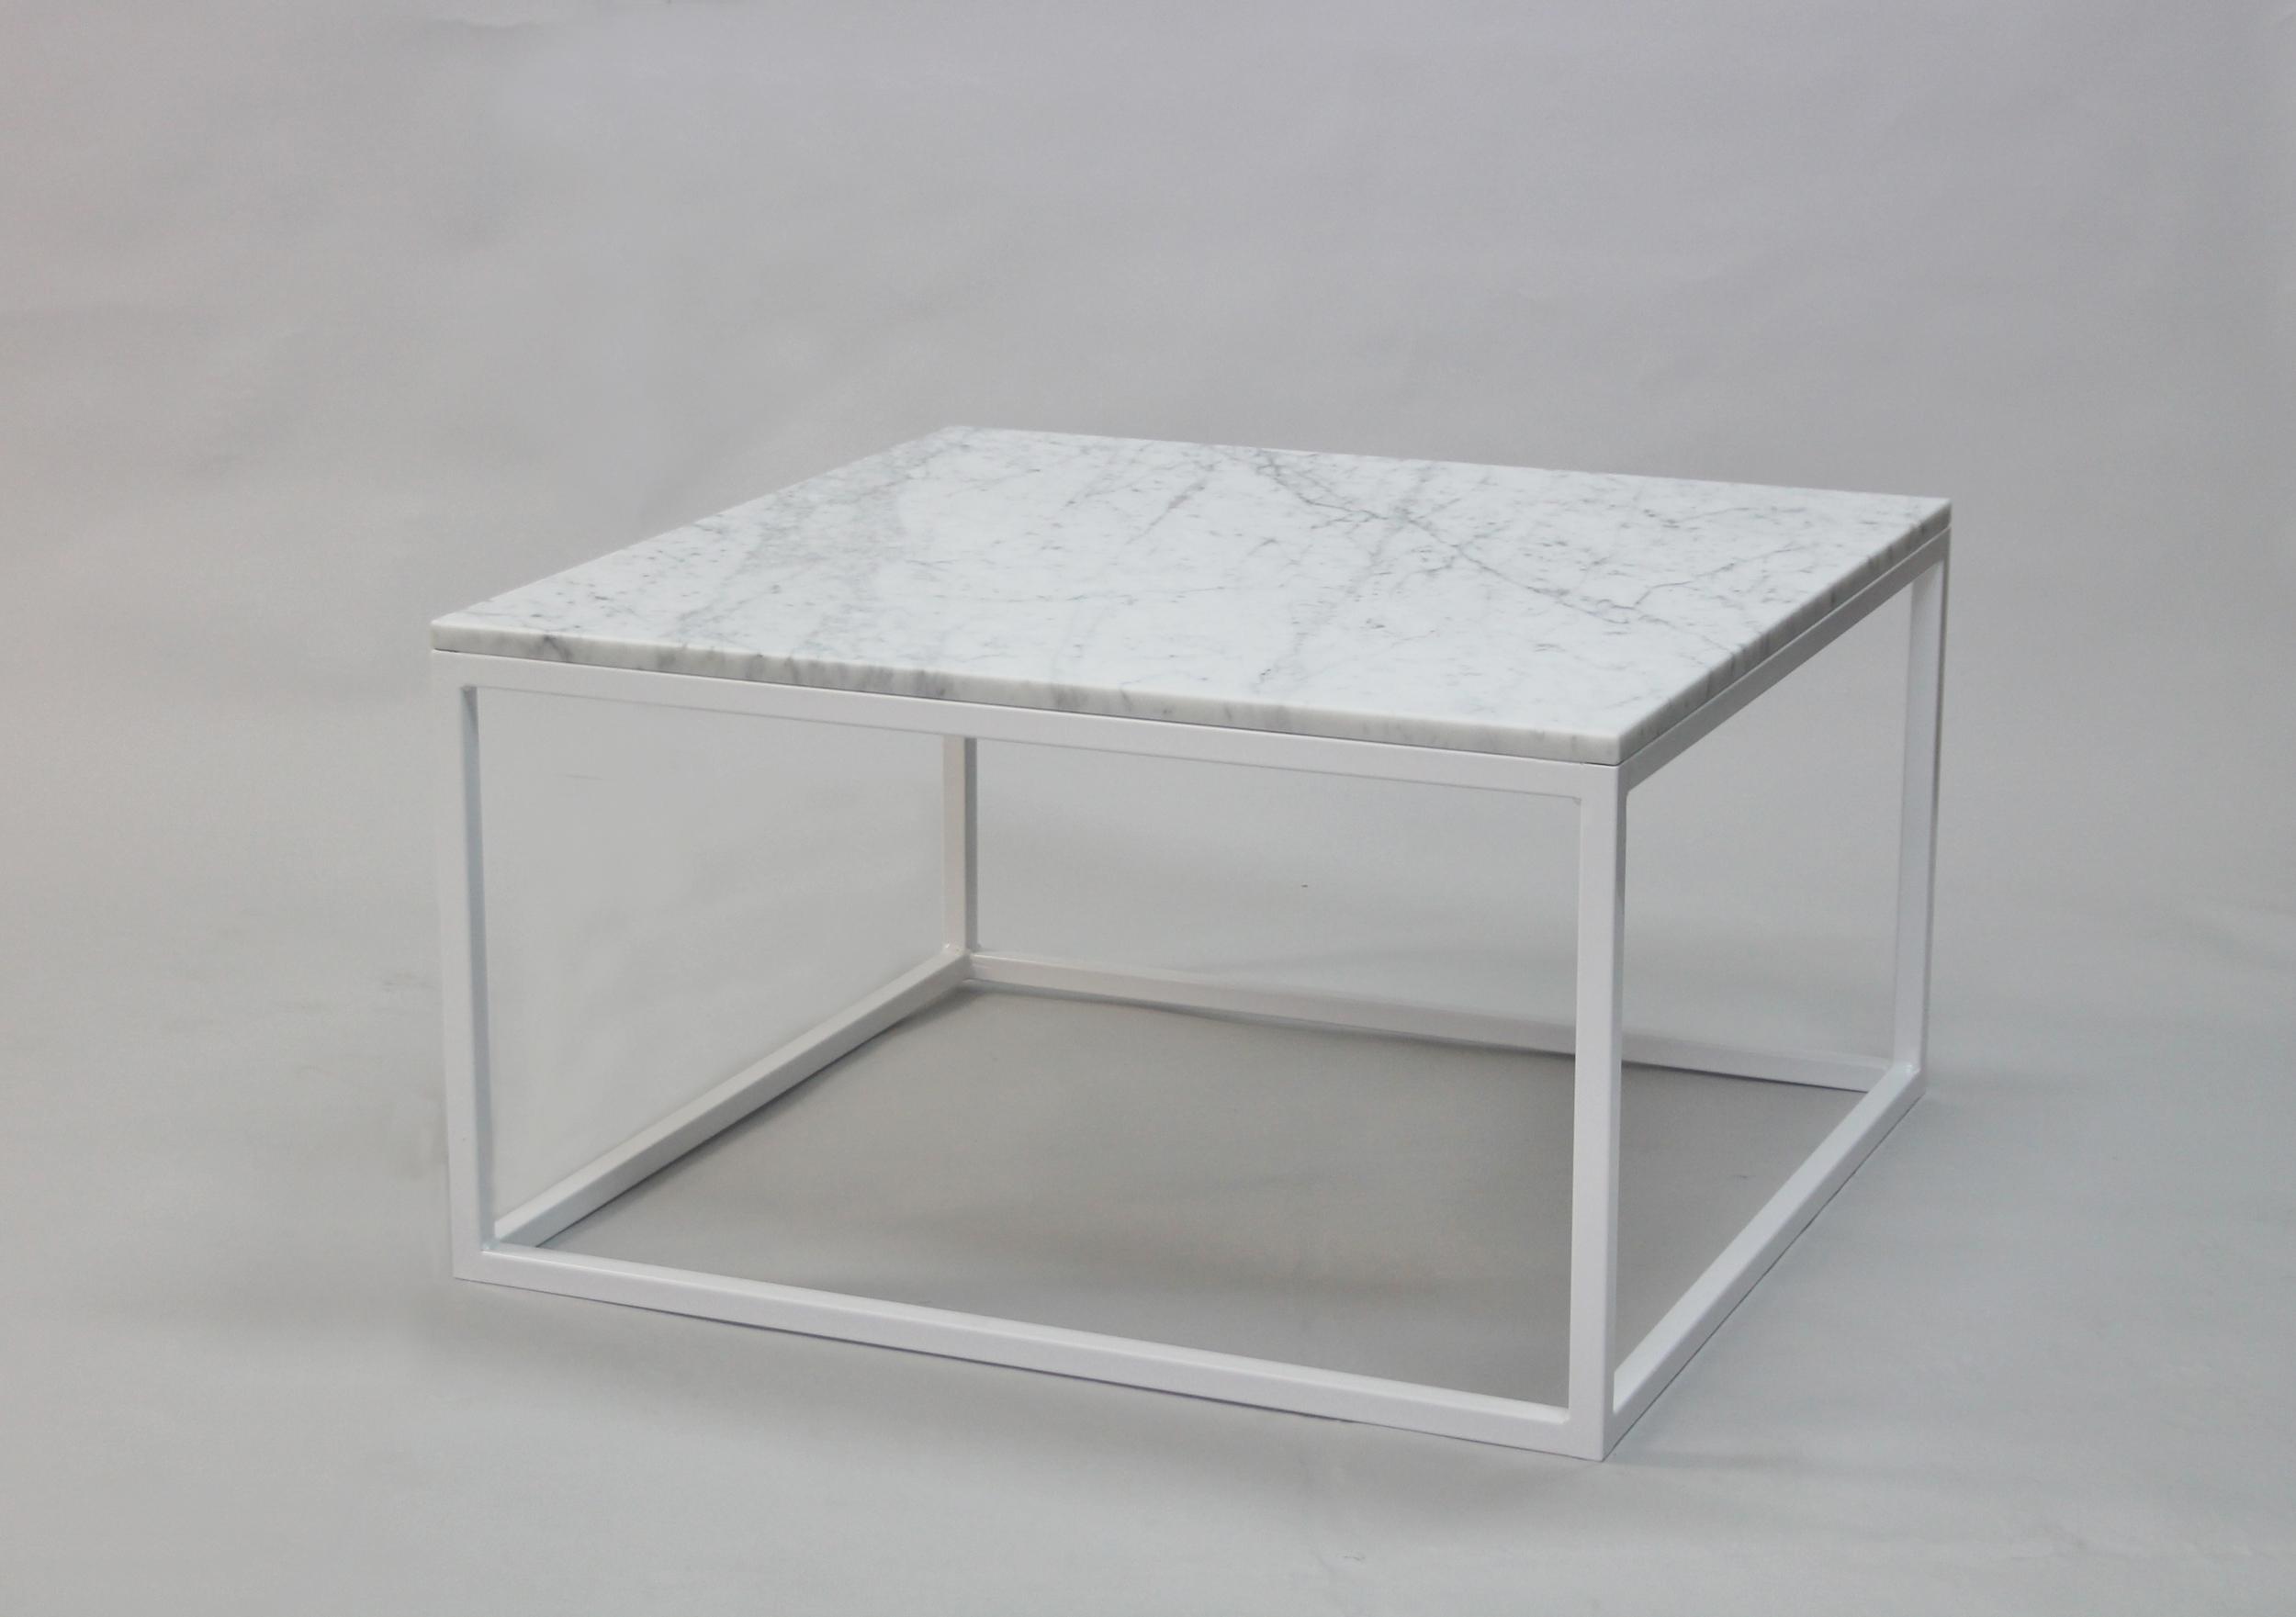 Marmorbord 80x80 H 45, vitt kub underrede